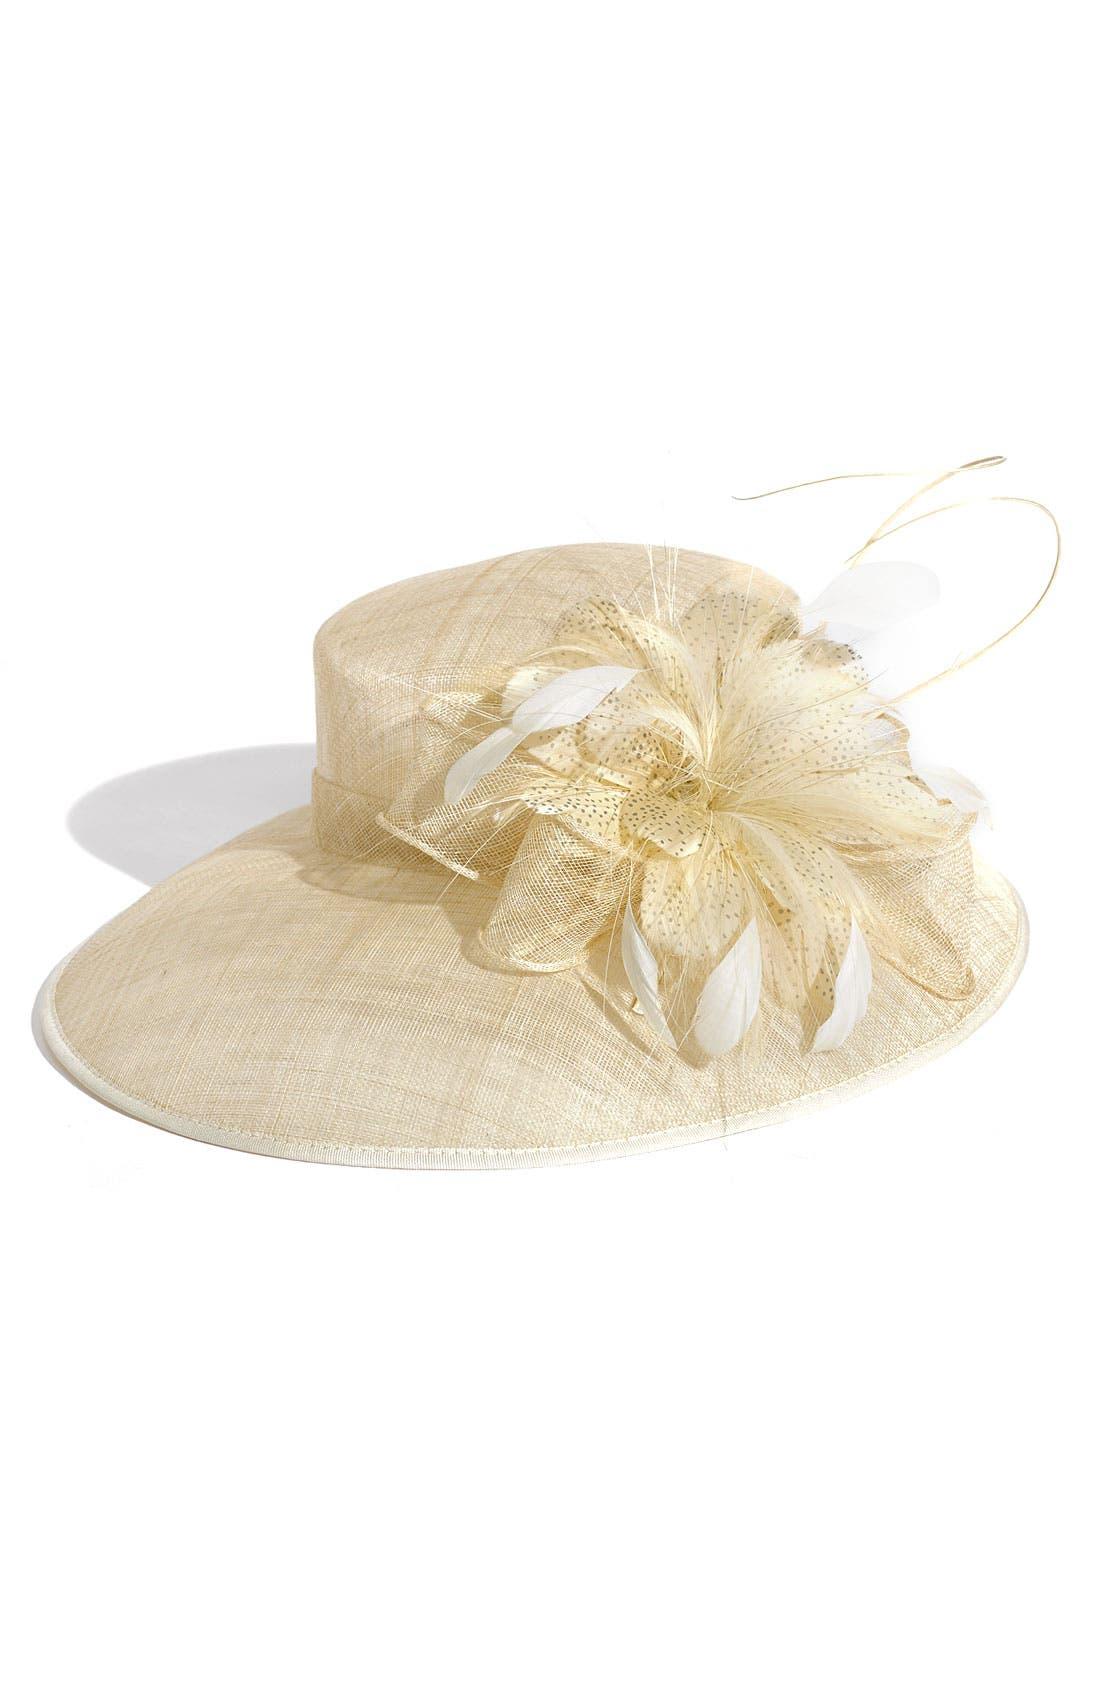 Alternate Image 1 Selected - Nordstrom Collection Wide Brim Hat